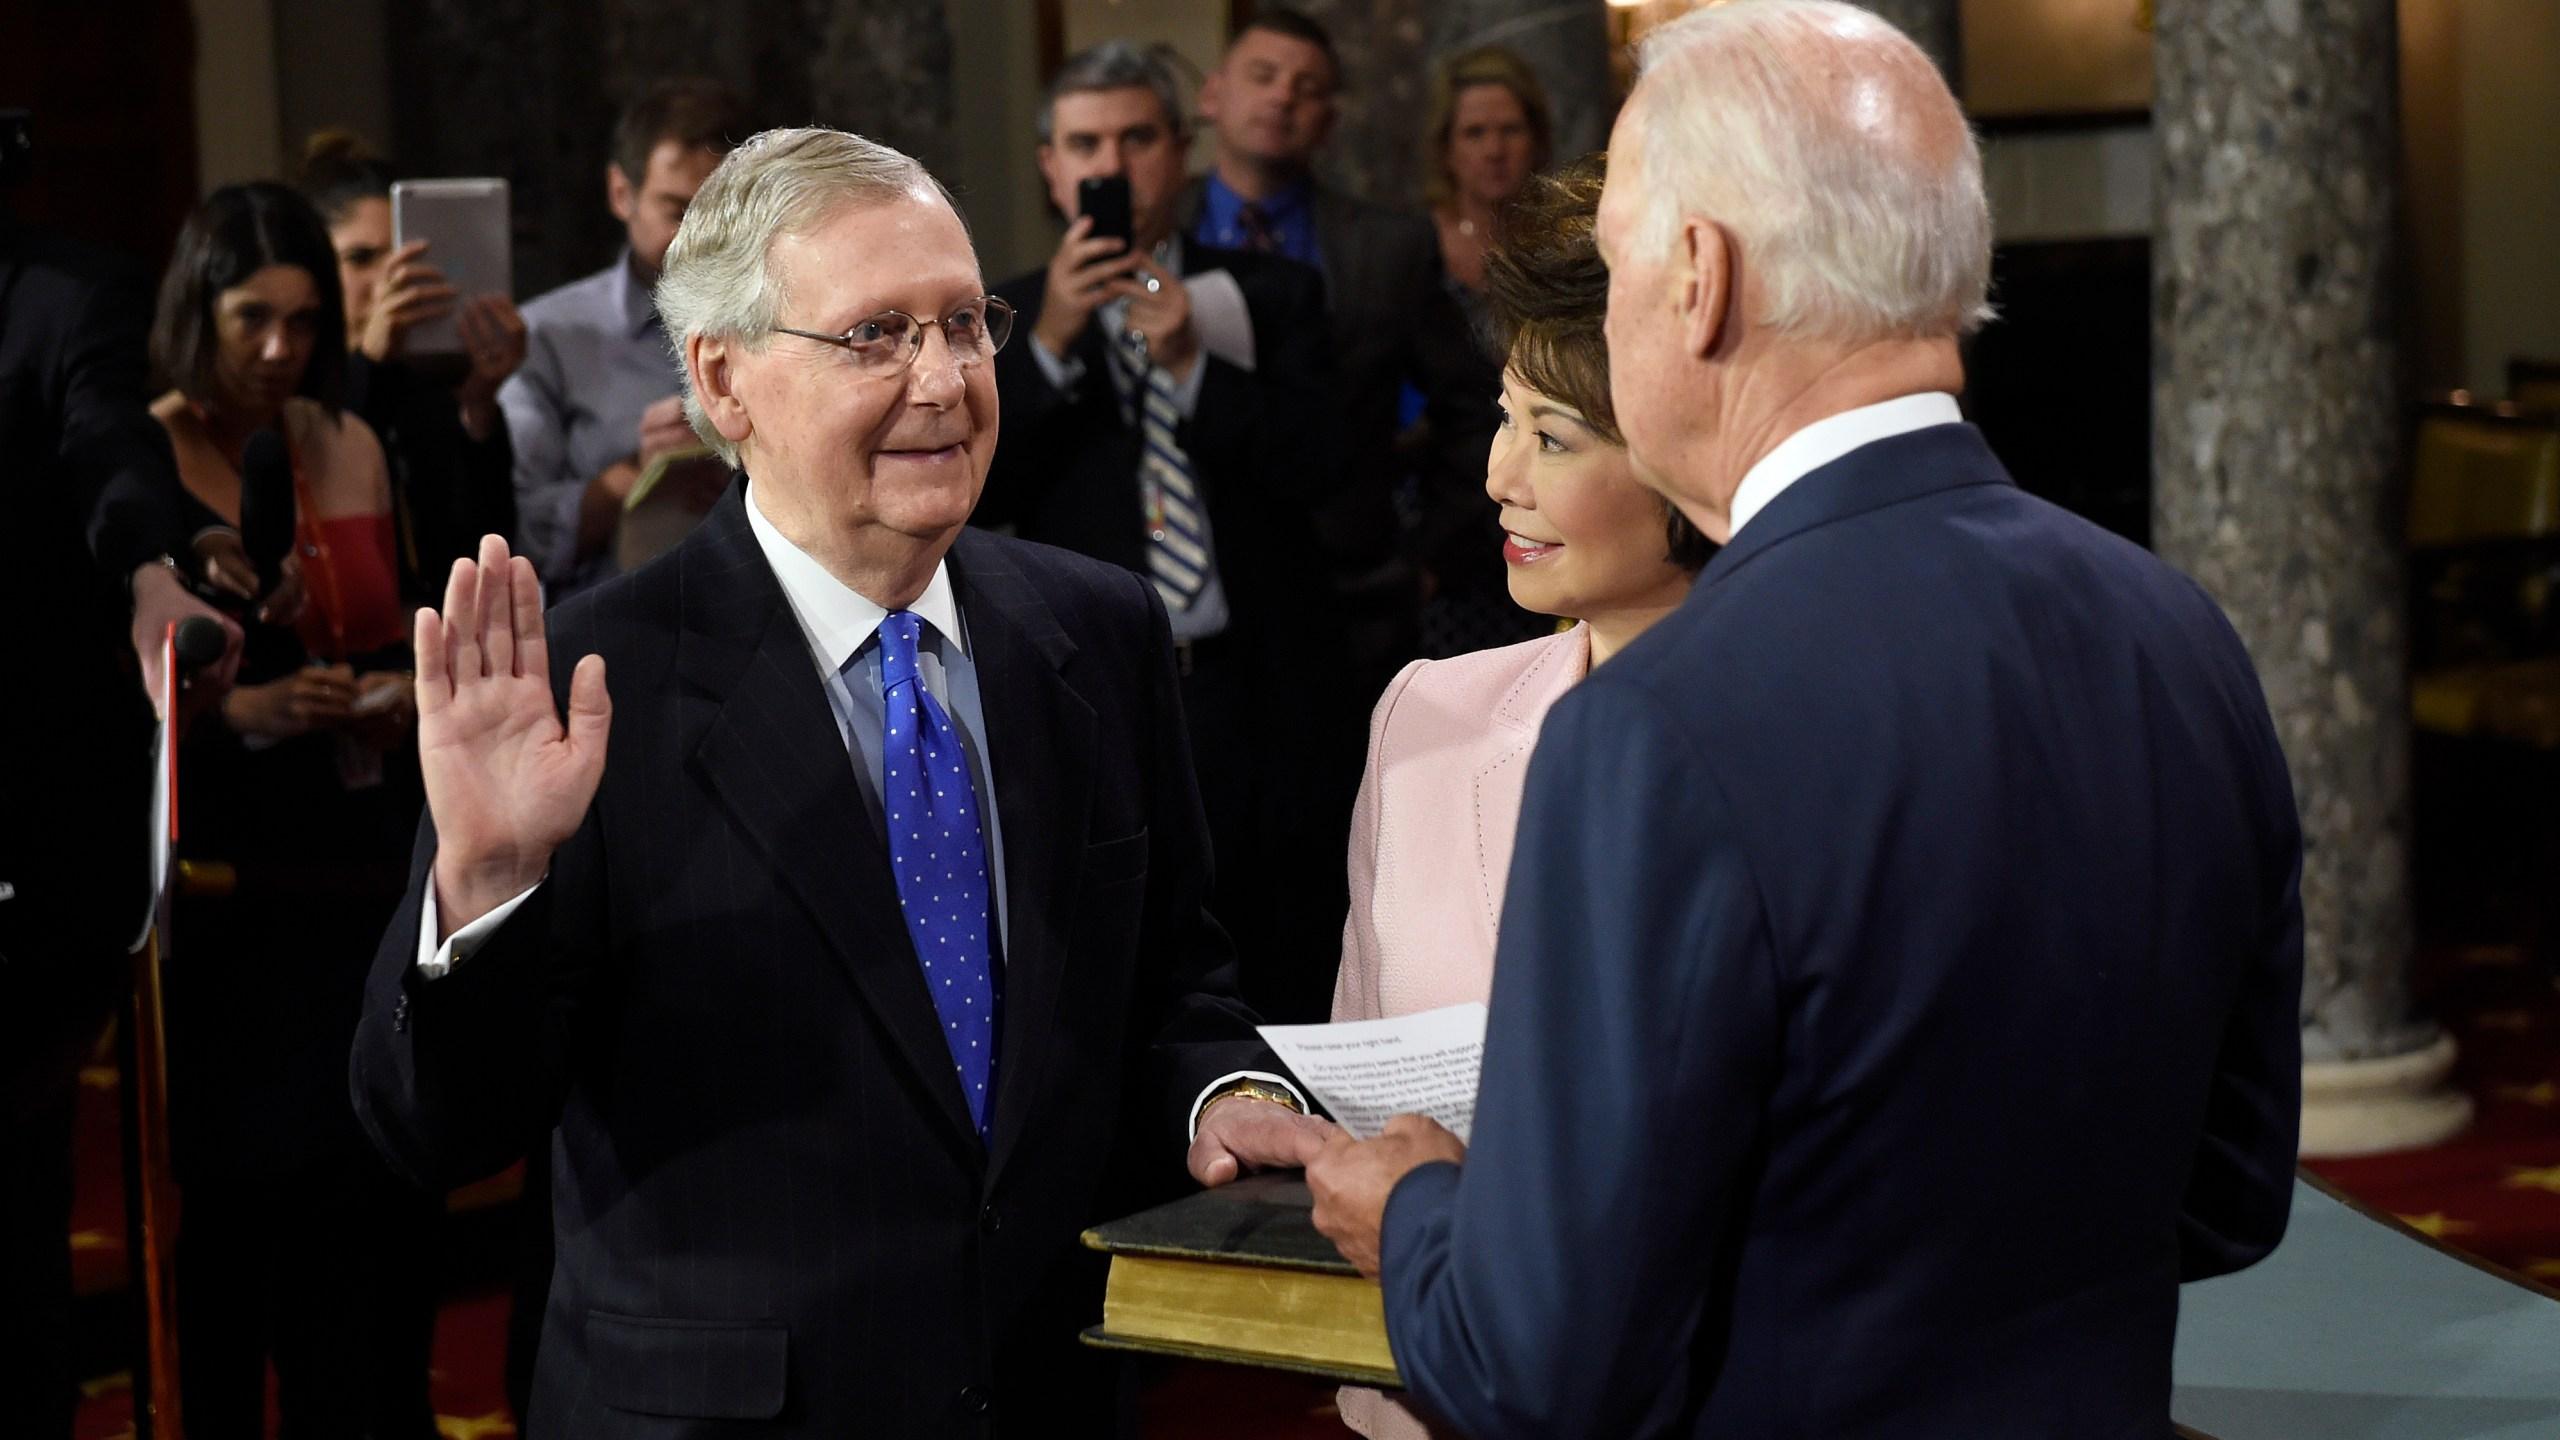 Joe Biden, Mitch Mcconnell, Elaine Chao